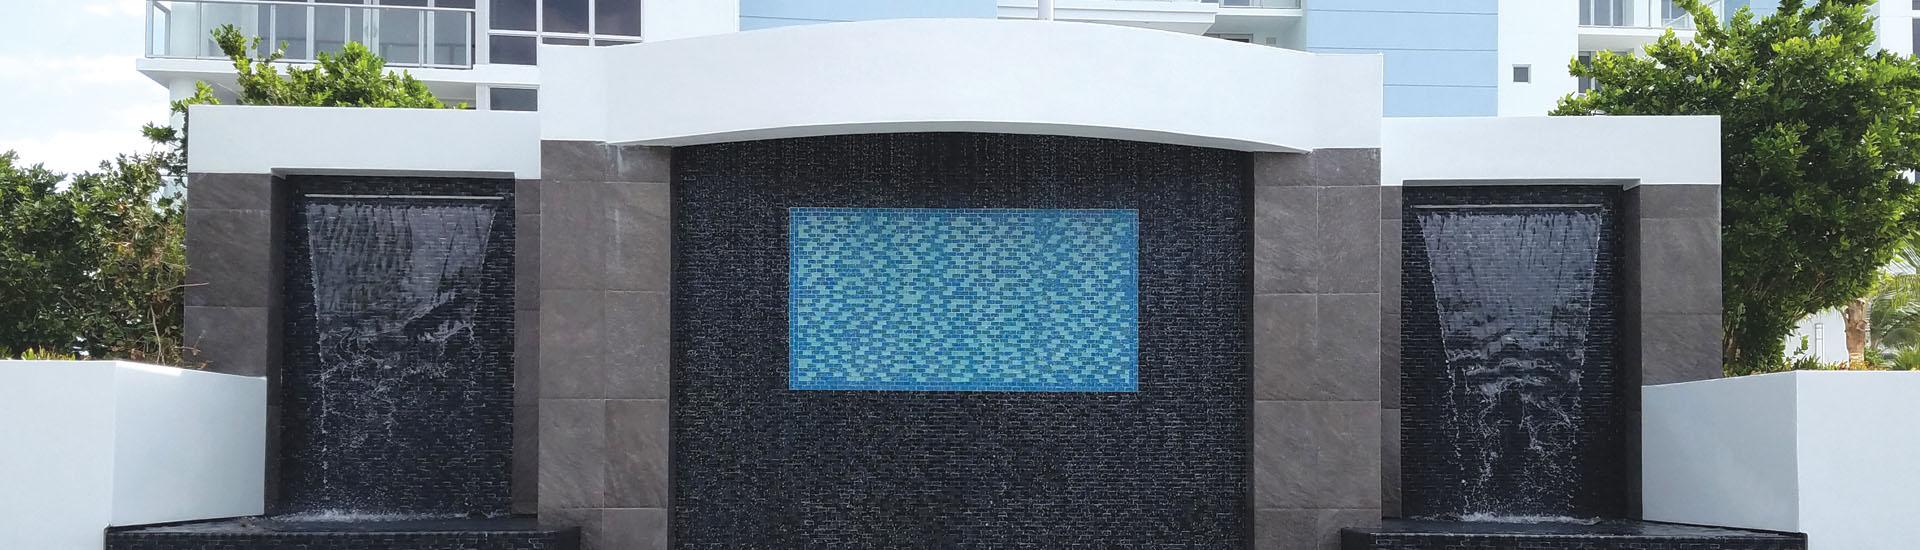 glass tile 1x2 artistry in mosaics